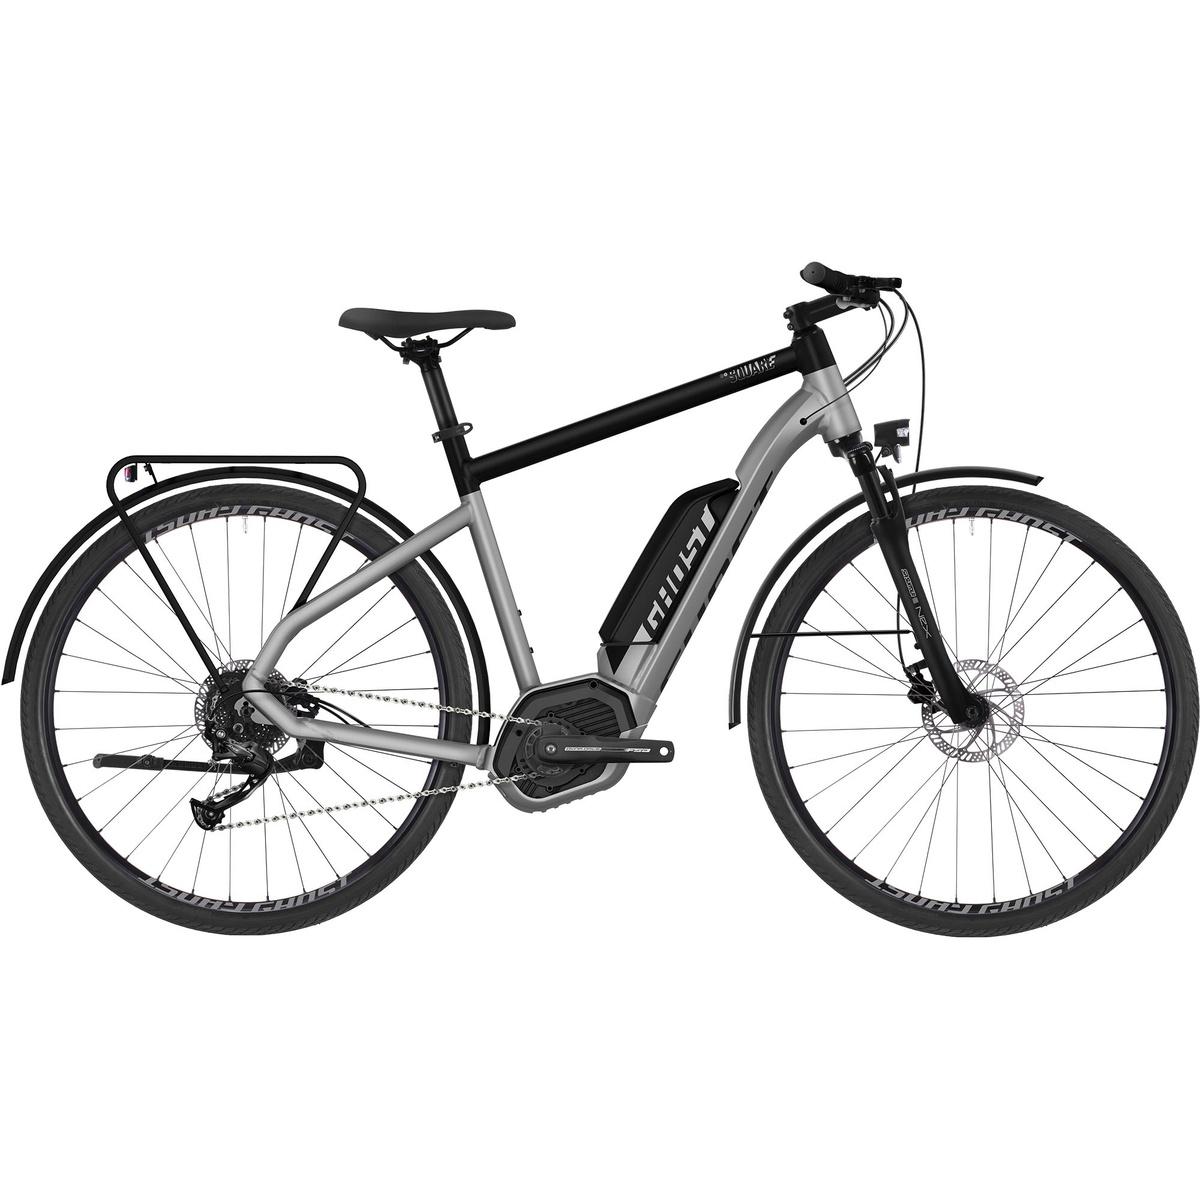 HYB Square Trekking B1.8 AL U 400 Wh, elcykel, unisex, Hvid | City